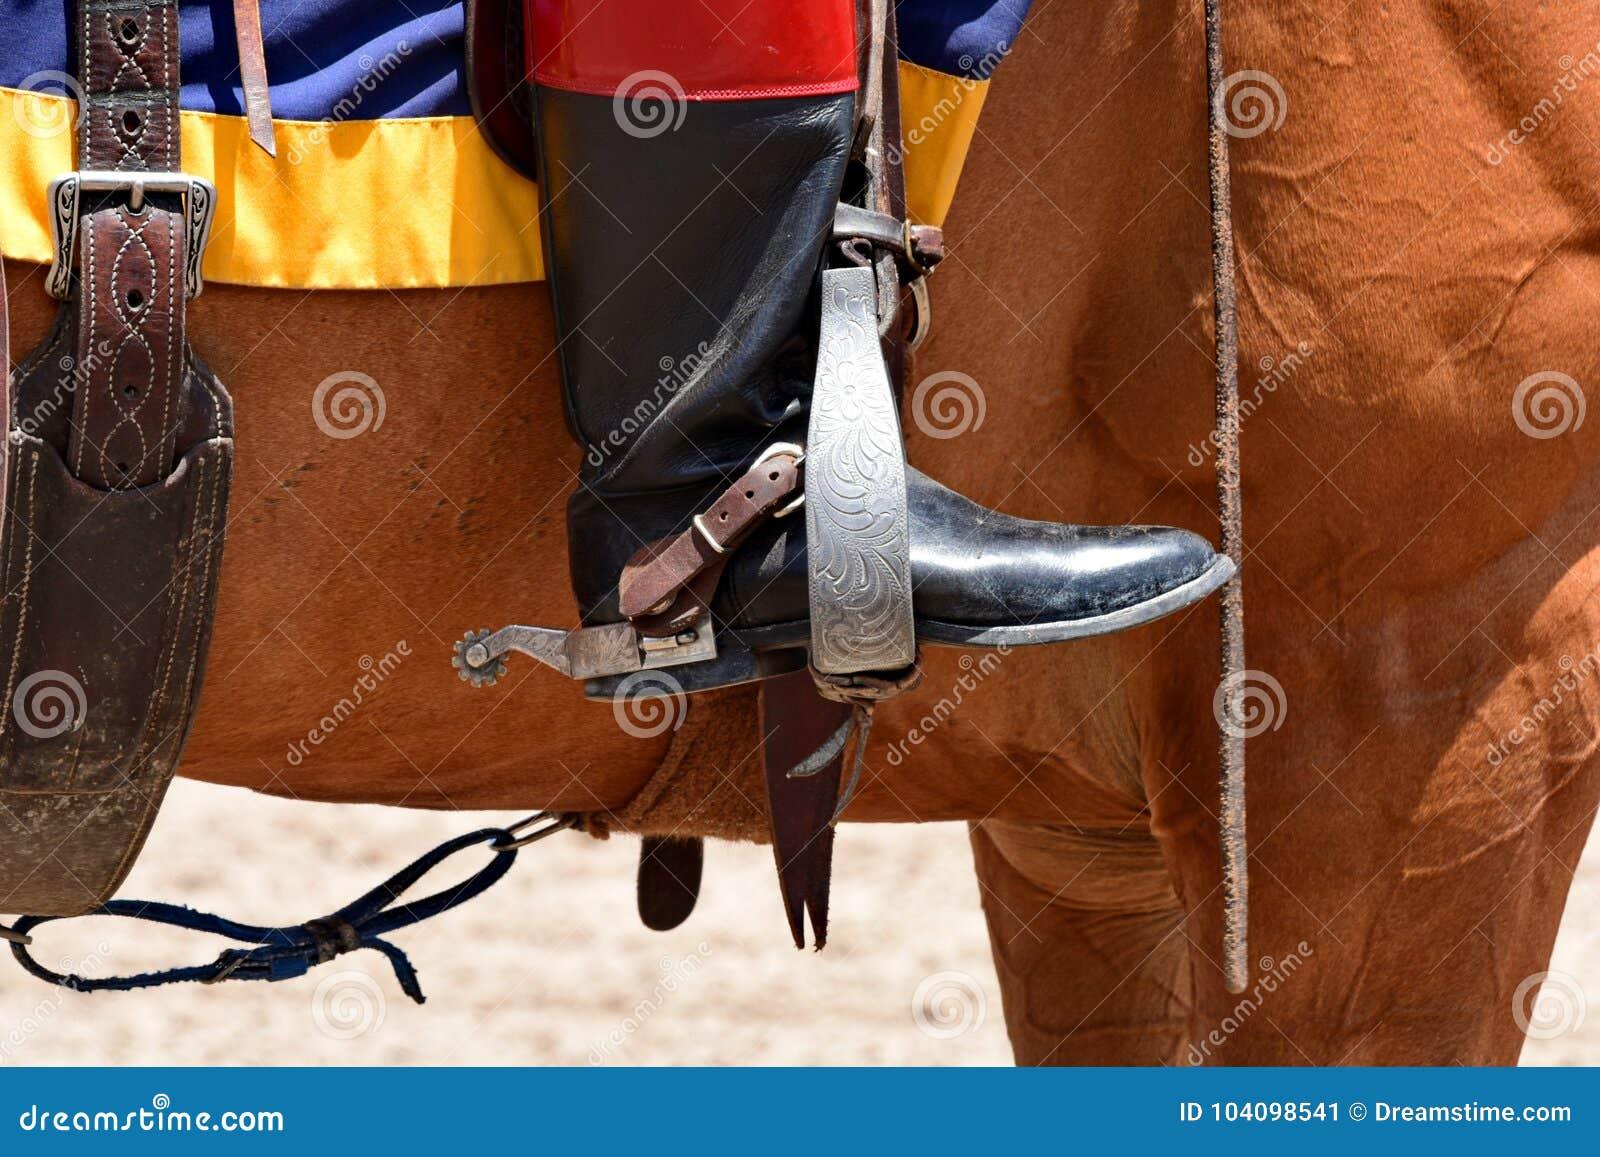 Horse Riding Gear Stock Image Image Of Riding Saddle 104098541